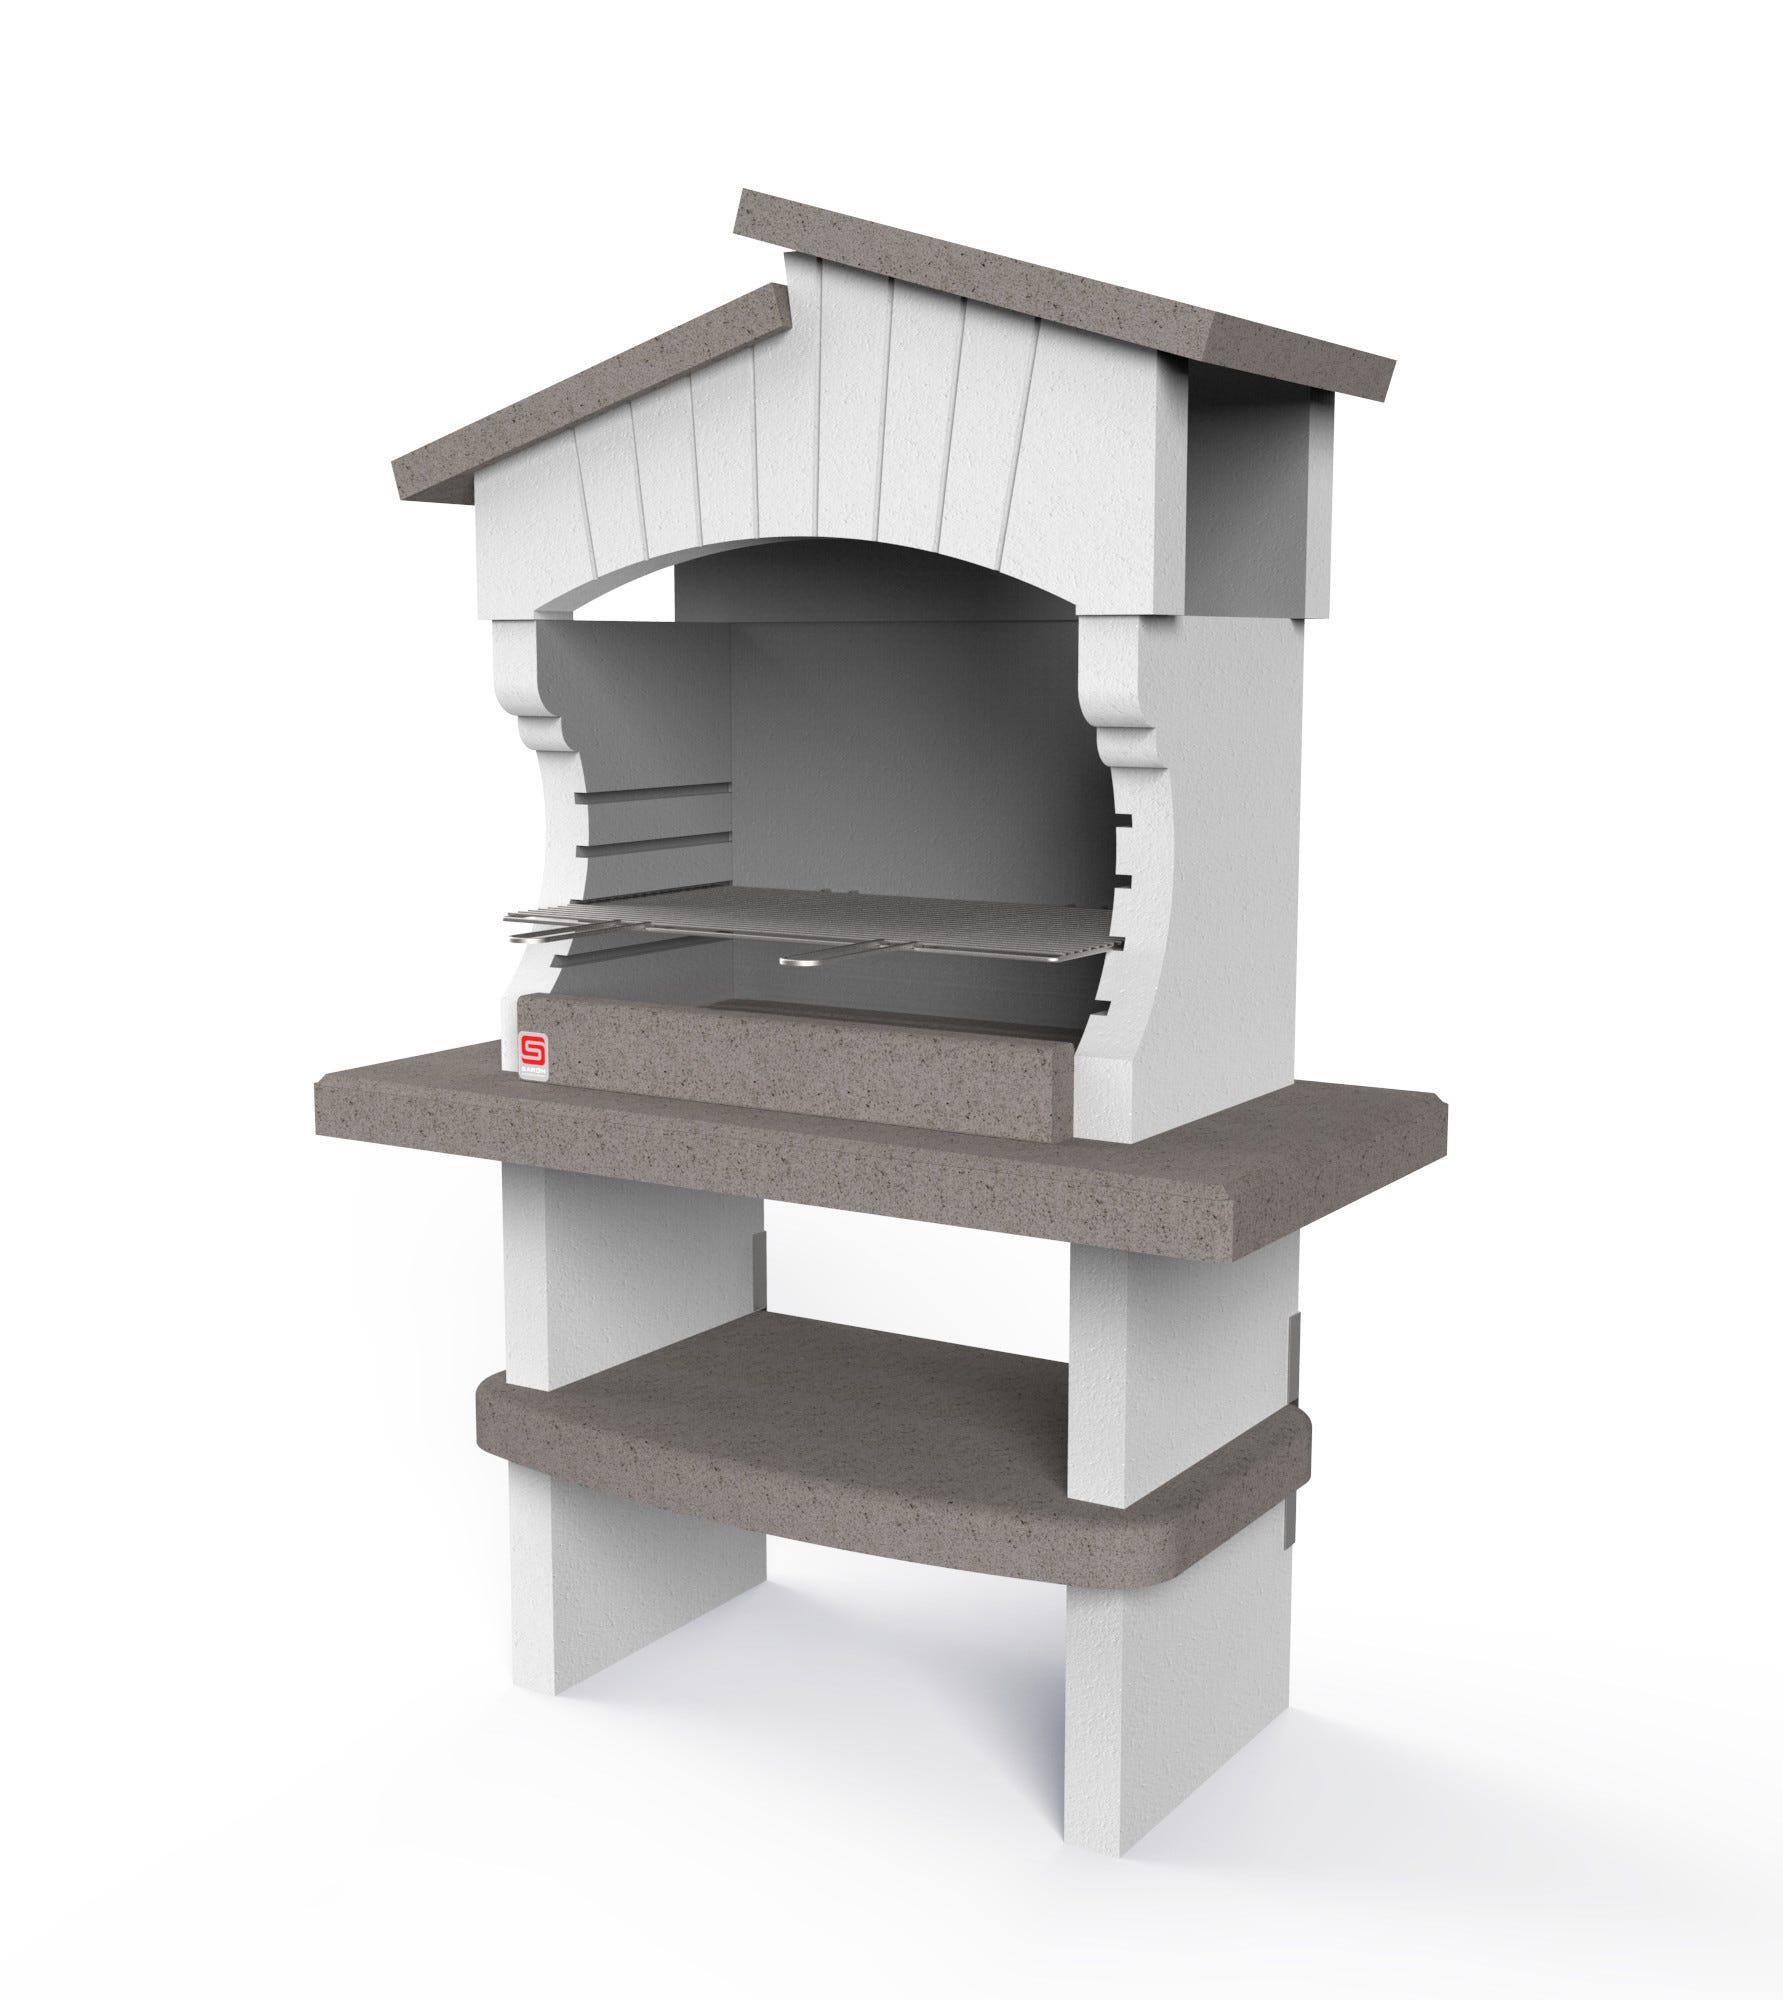 barbecue bogota' 125x64x184 cm 408 kg legna e carbonella griglia 77x40 cm